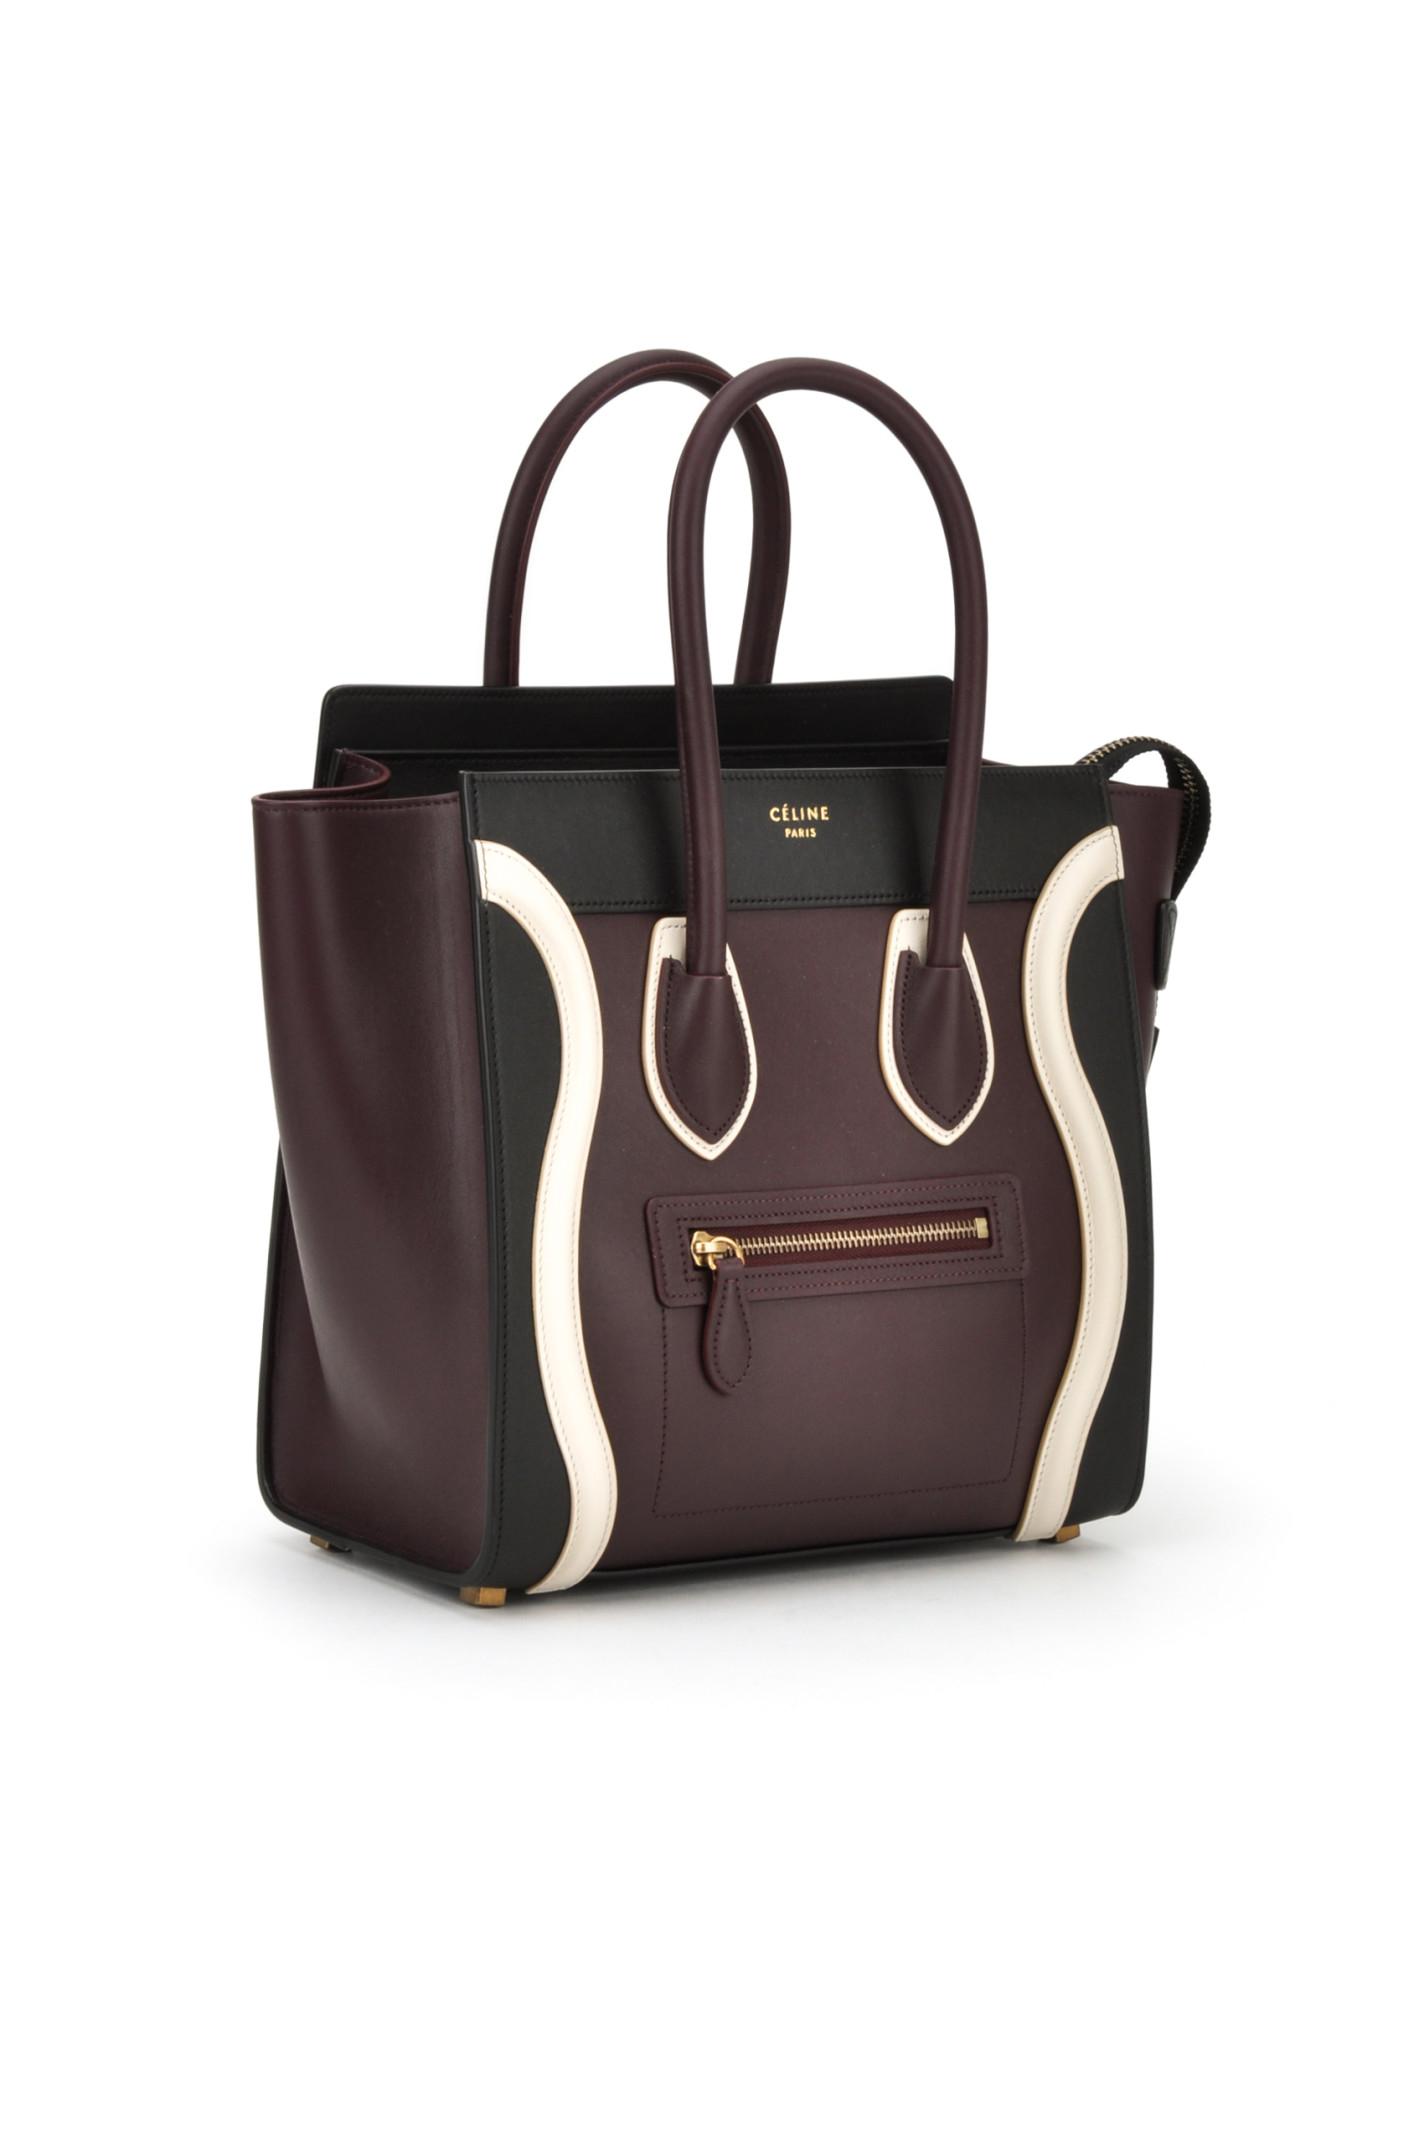 celine luggage leather bowling bag